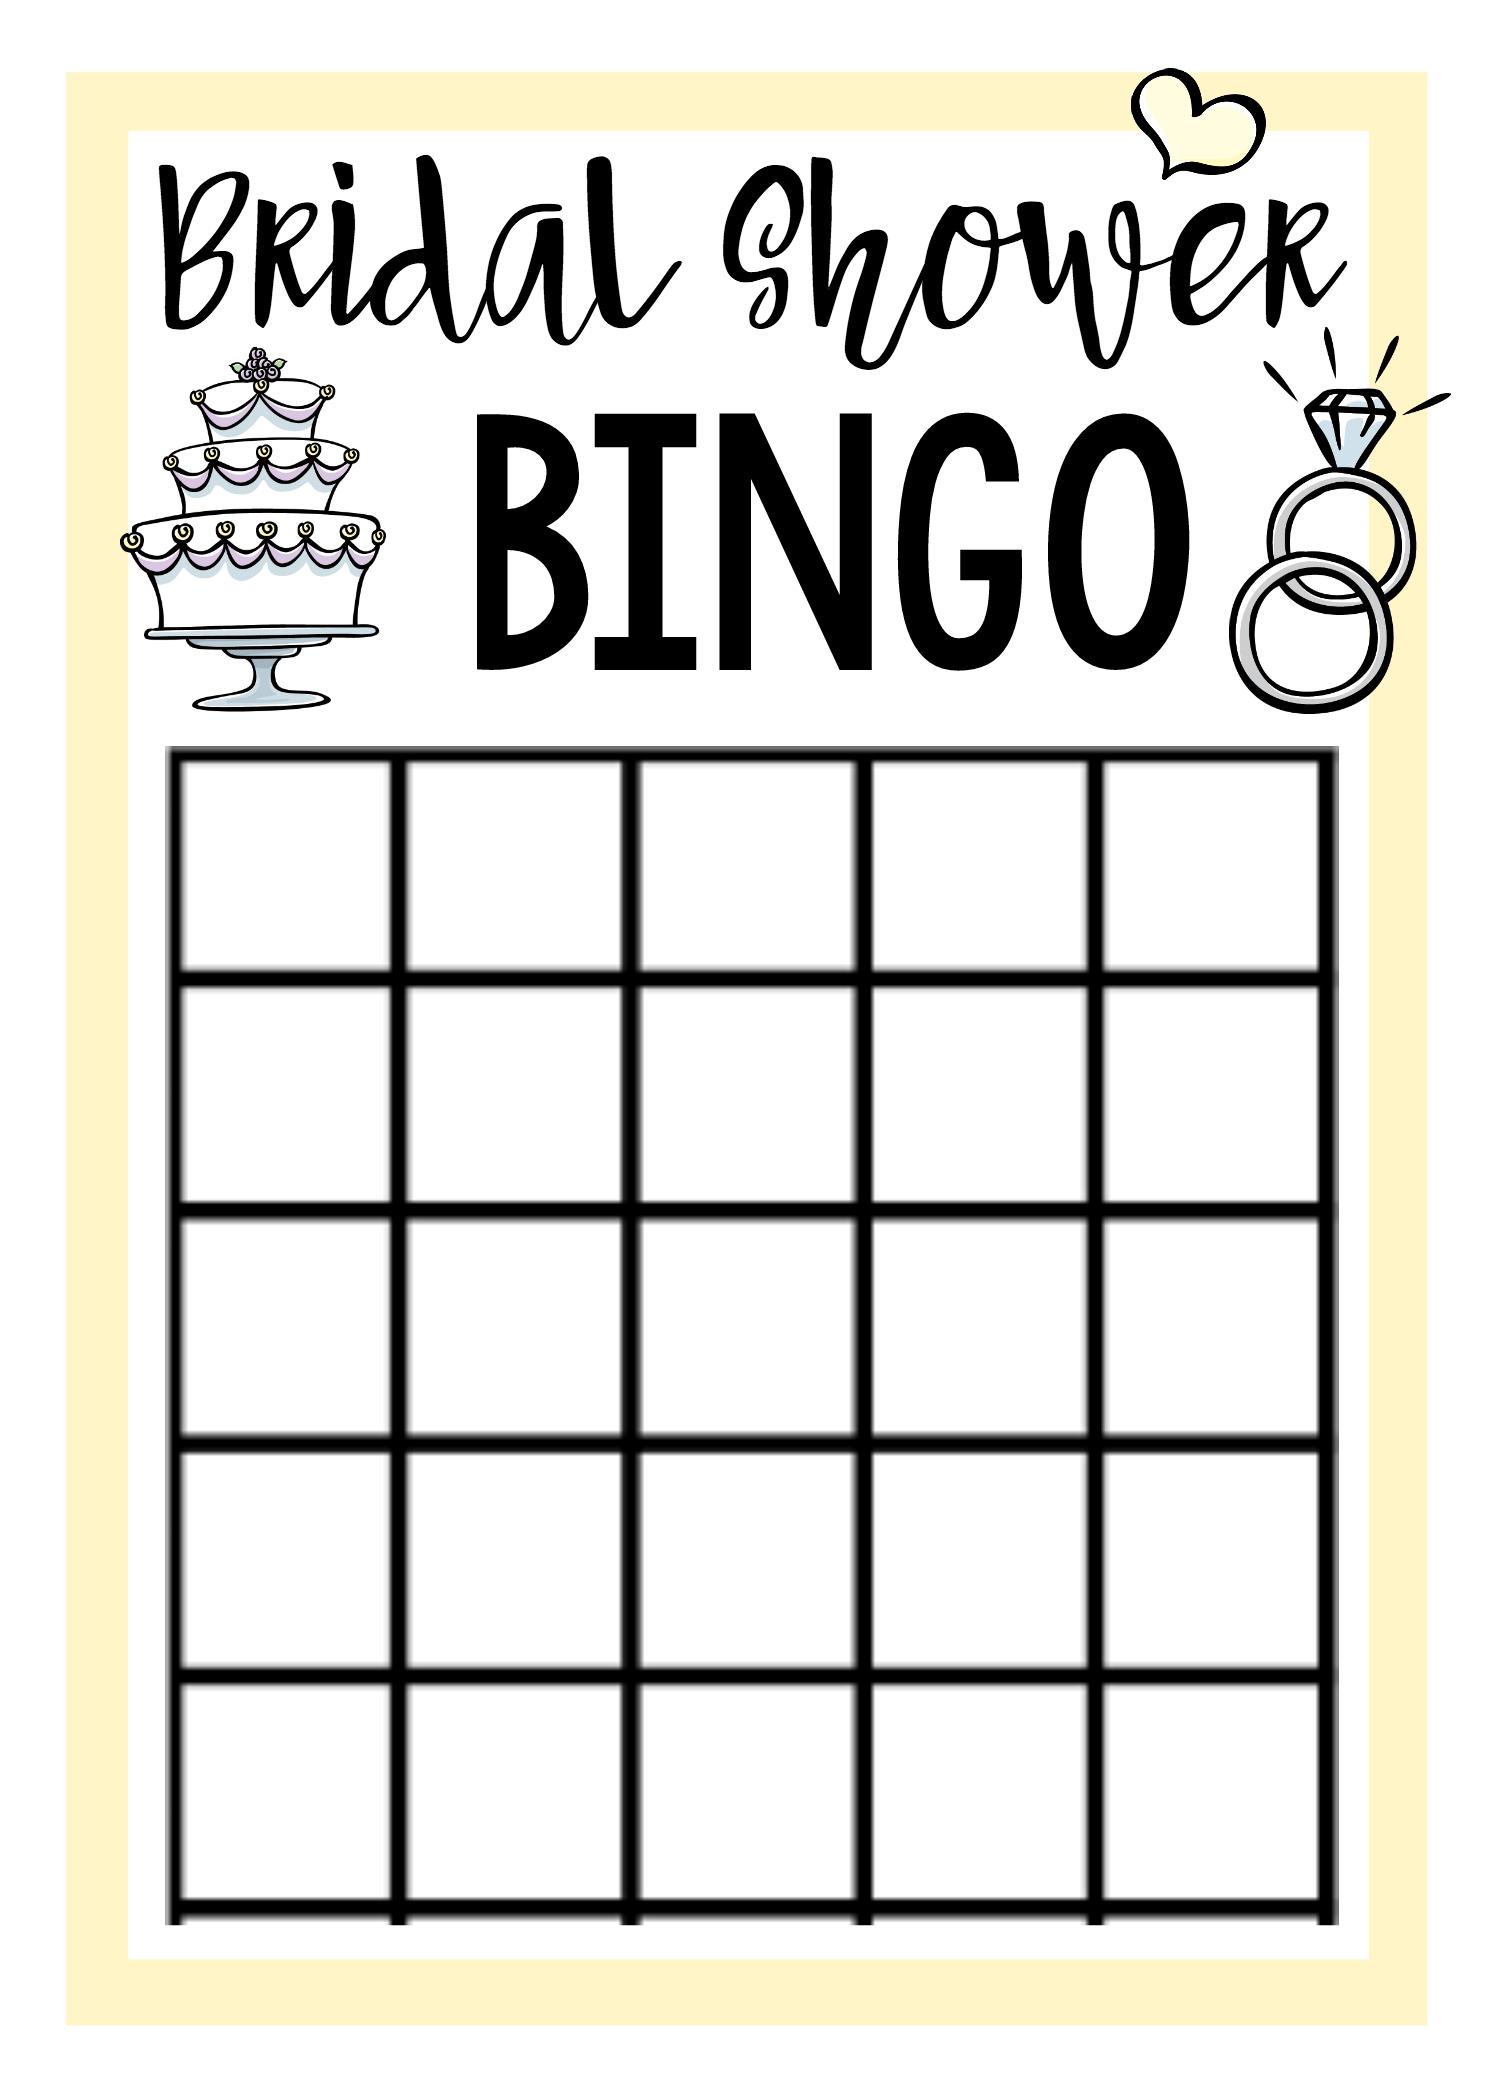 Free Printable Bridal Shower Games | Bridal Stuff | Pinterest - Free Printable Bridal Shower Bingo